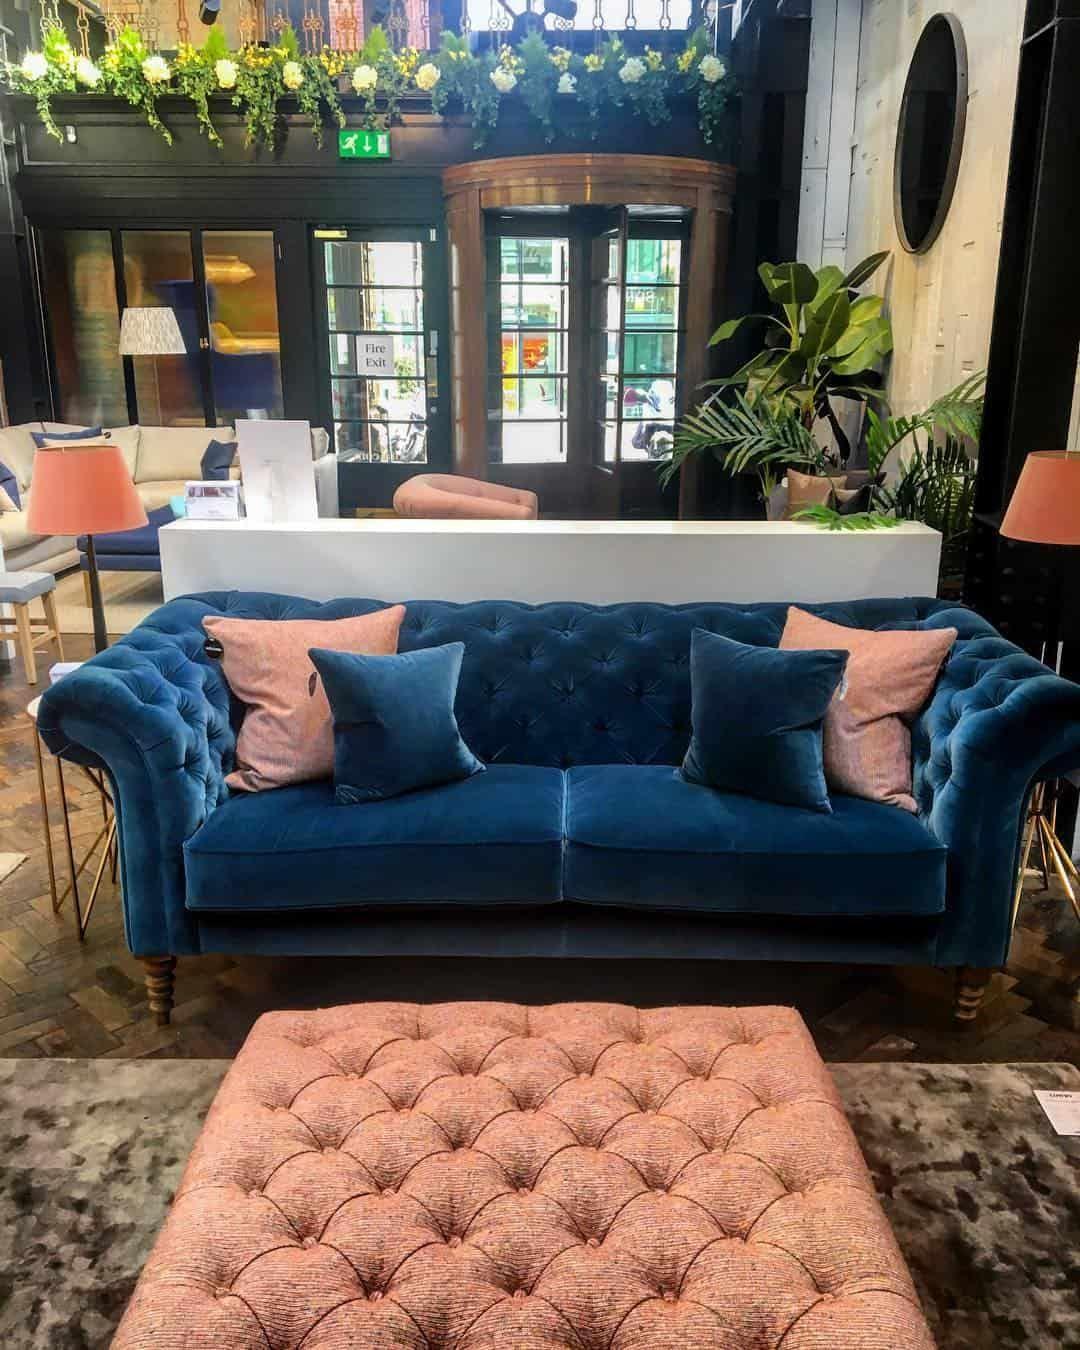 Sofa Trends 2020 And Sofa Design 2020 In 2020 Sofa Design Modern Furniture Living Room Furniture